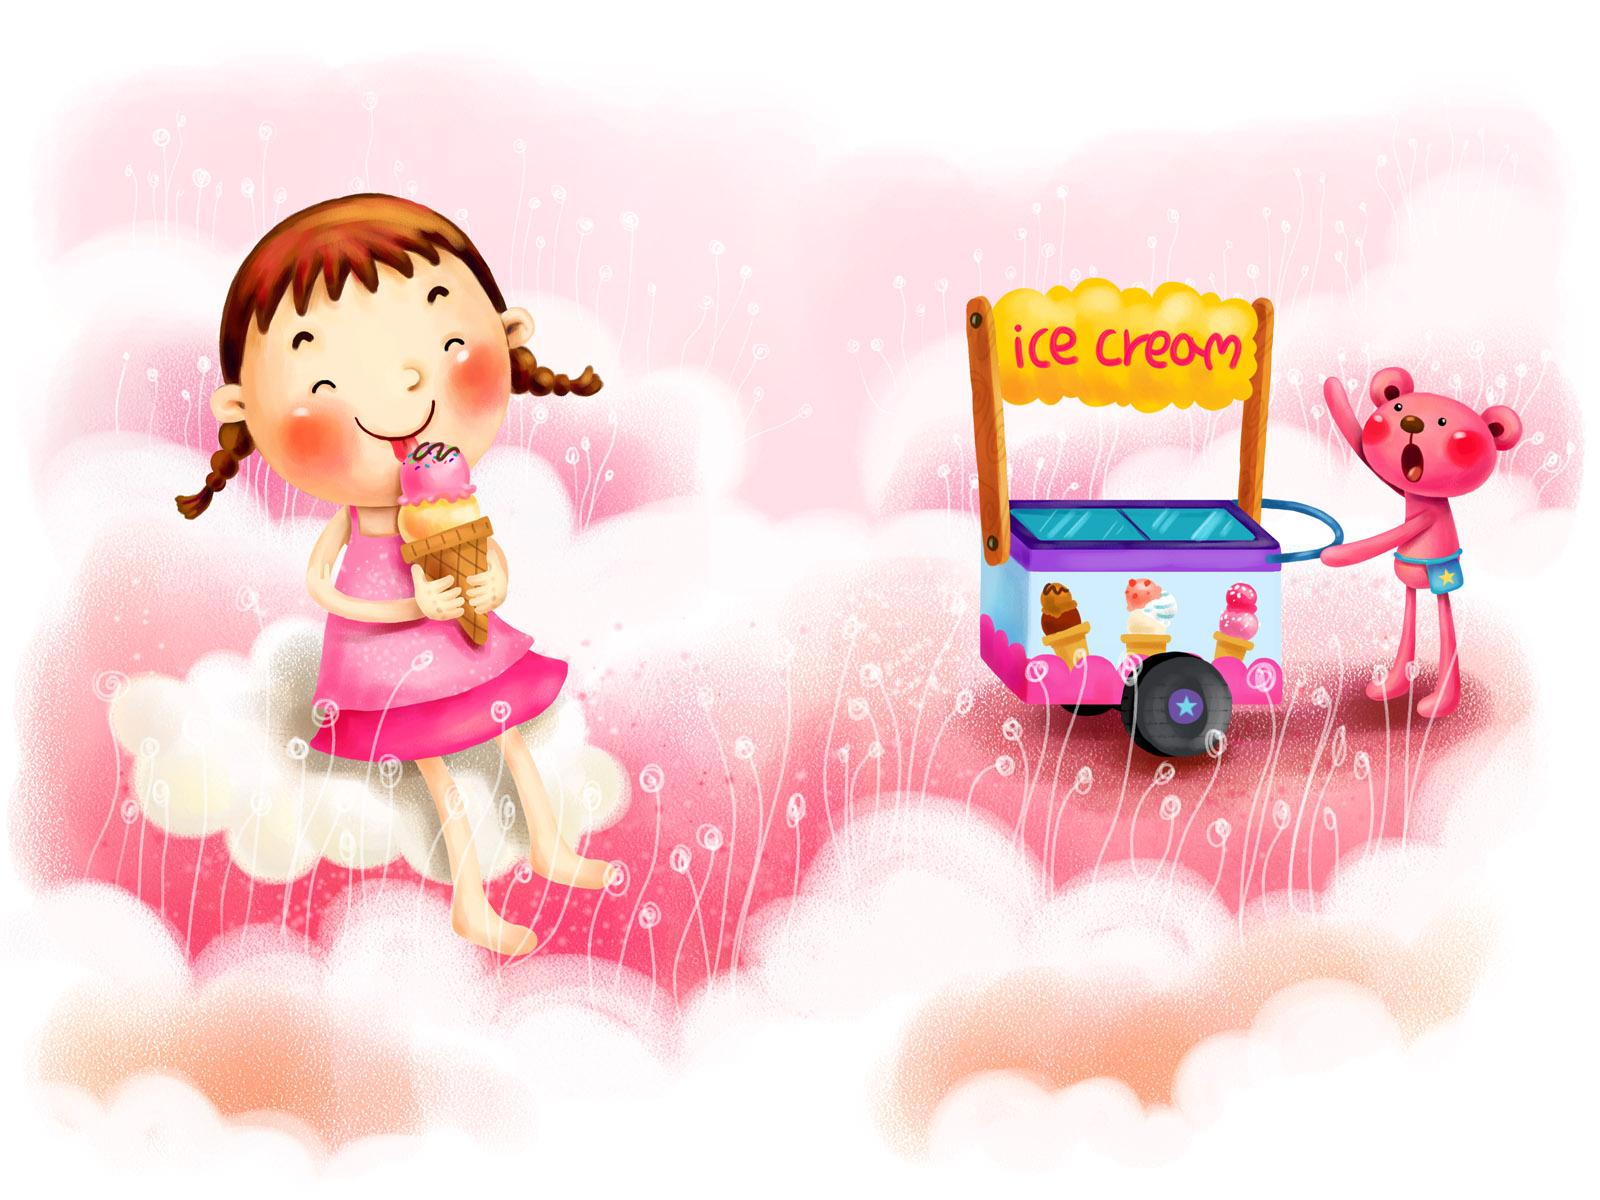 Cute Tofu Desktop Wallpaper Download Free Cute Ice Cream Wallpapers Pixelstalk Net